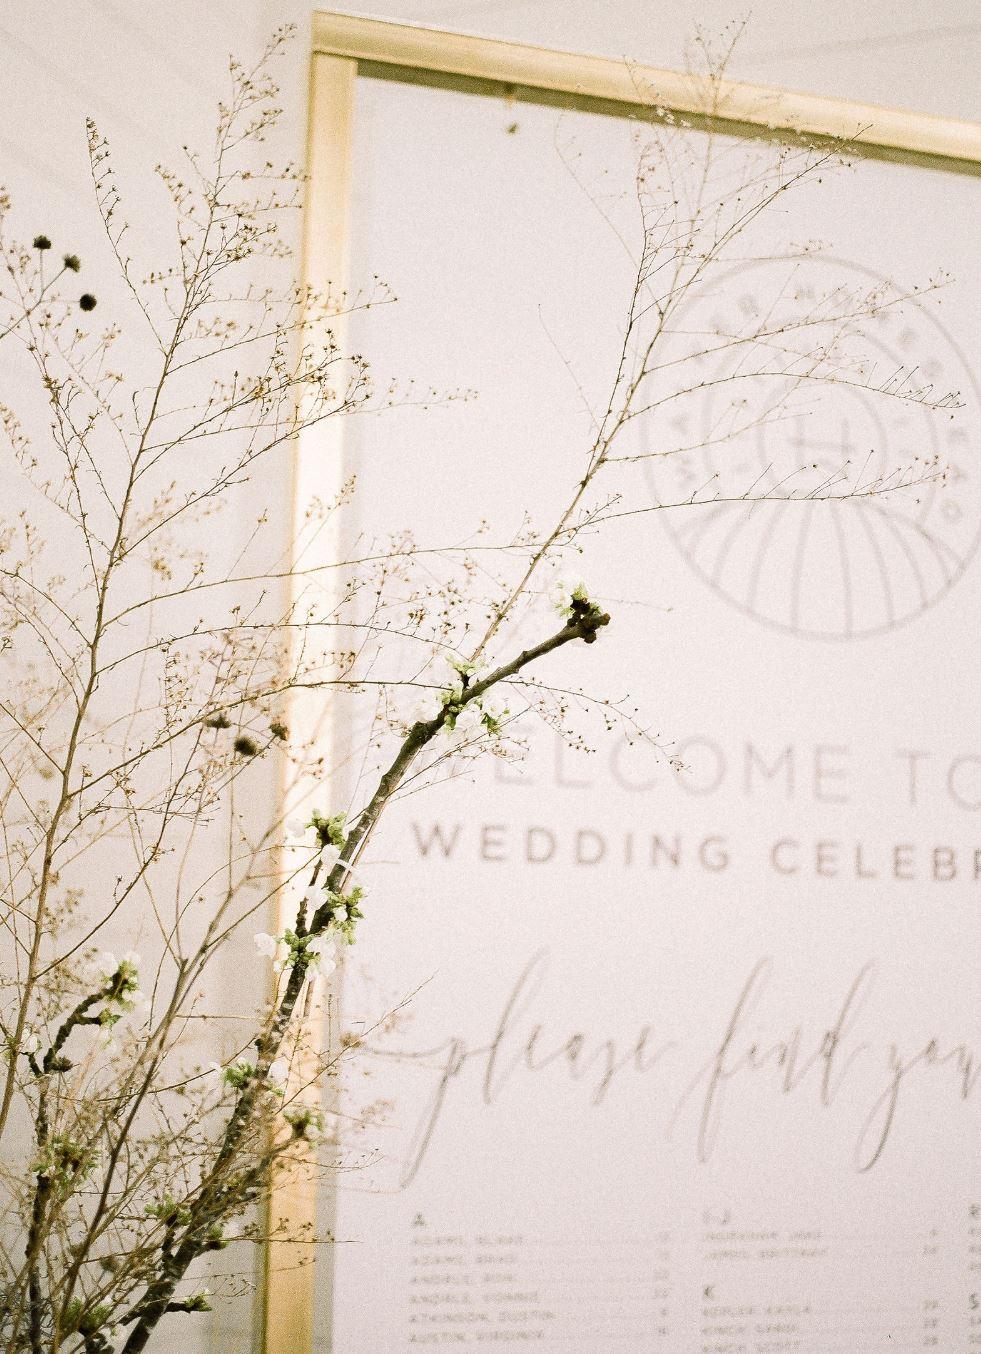 Walker Homestead Wedding Sign.JPG